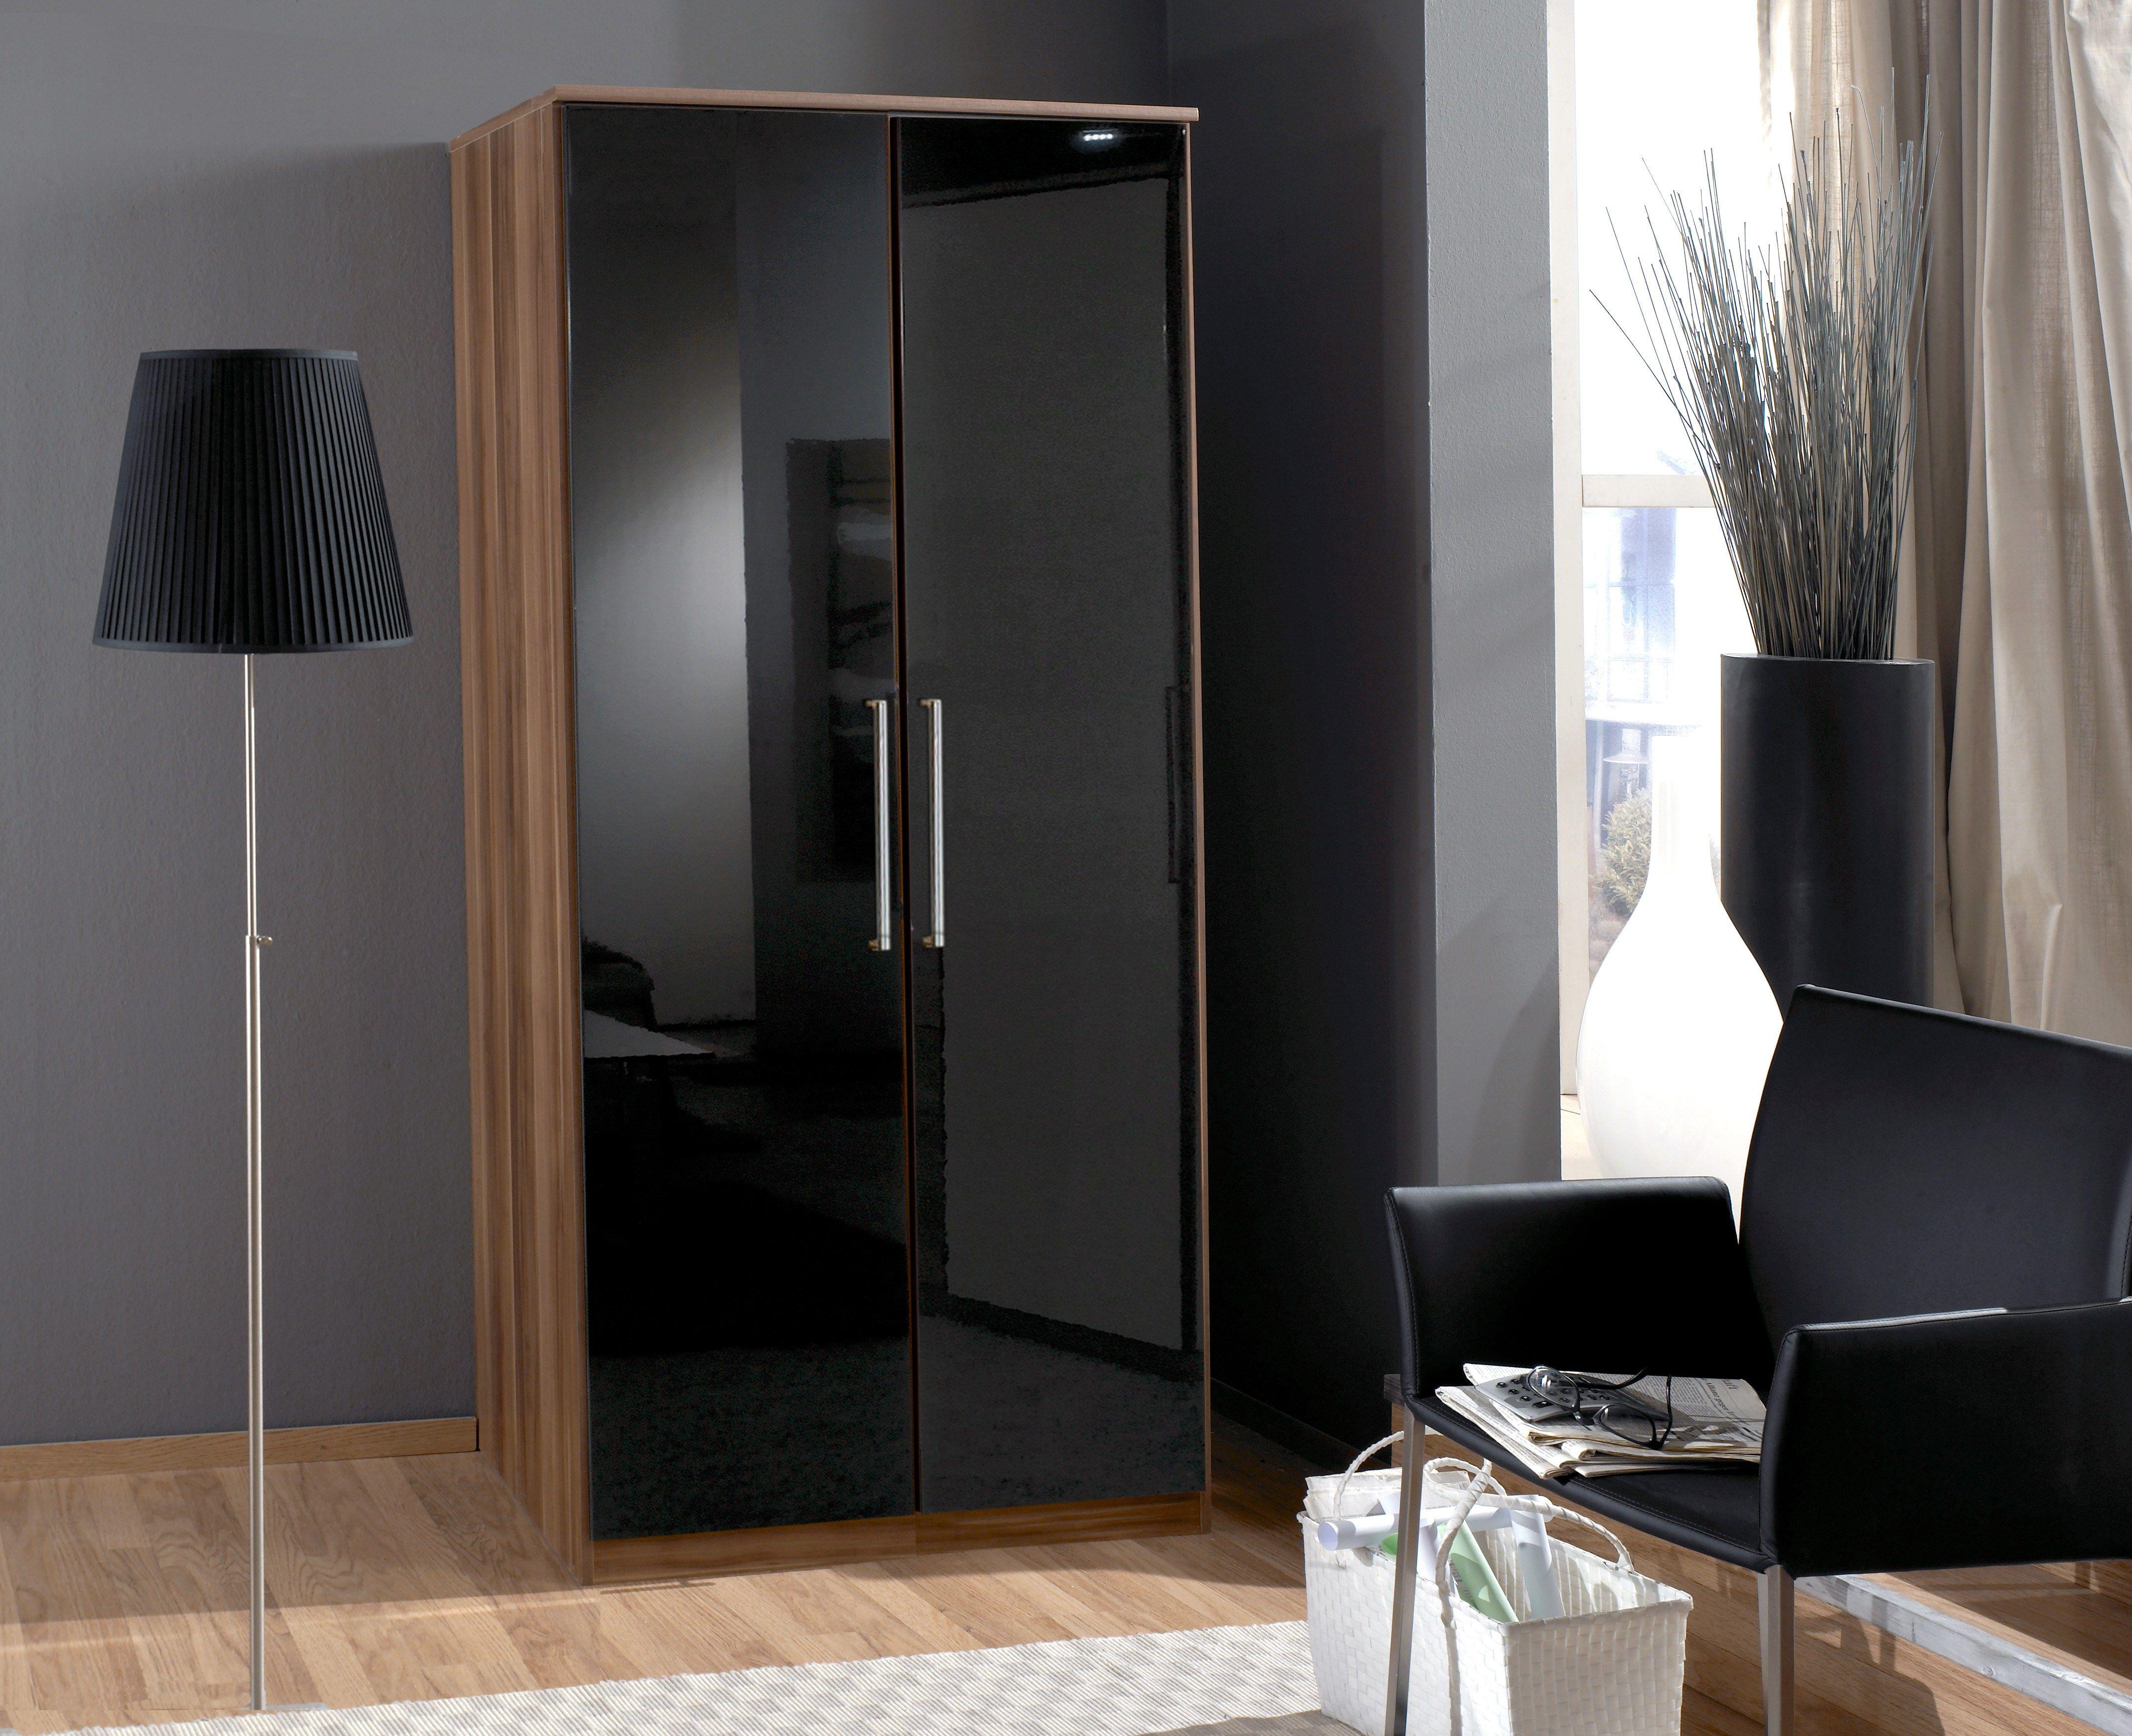 Buy Black and Walnut 2 Door Wardrobe Armoire Closet ...